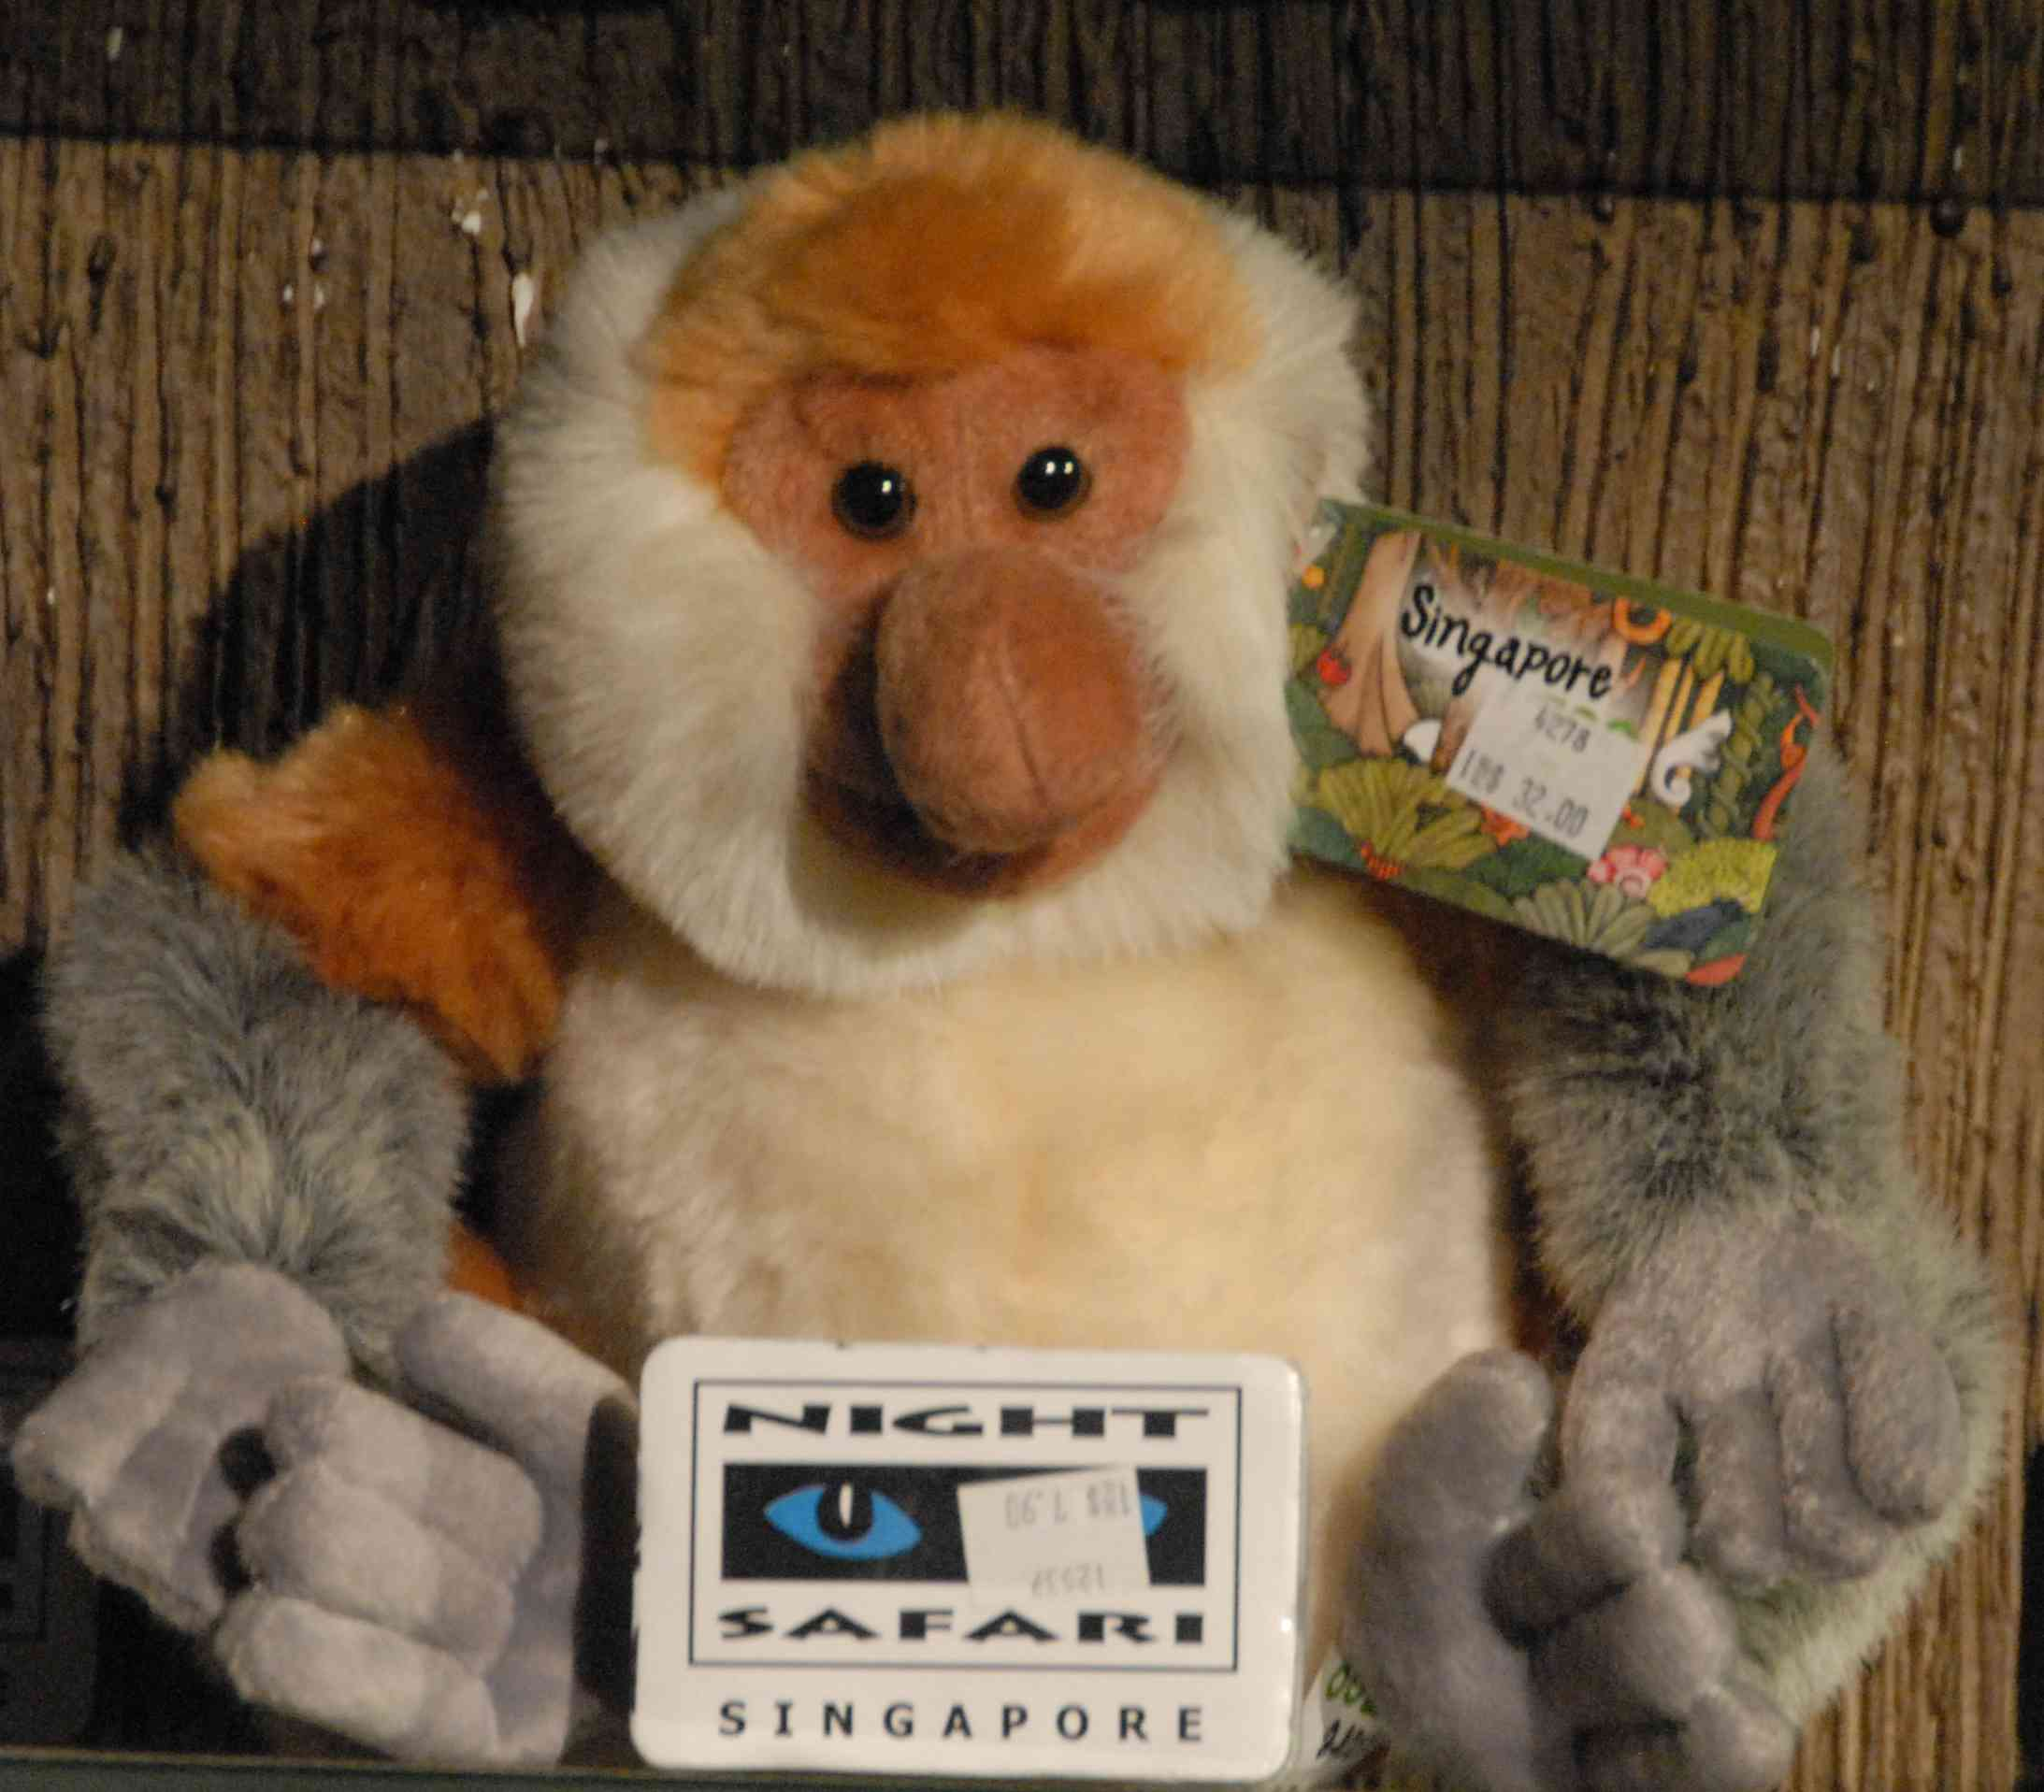 http://www.prise2tete.fr/upload/NickoGecko-nasique1.jpg